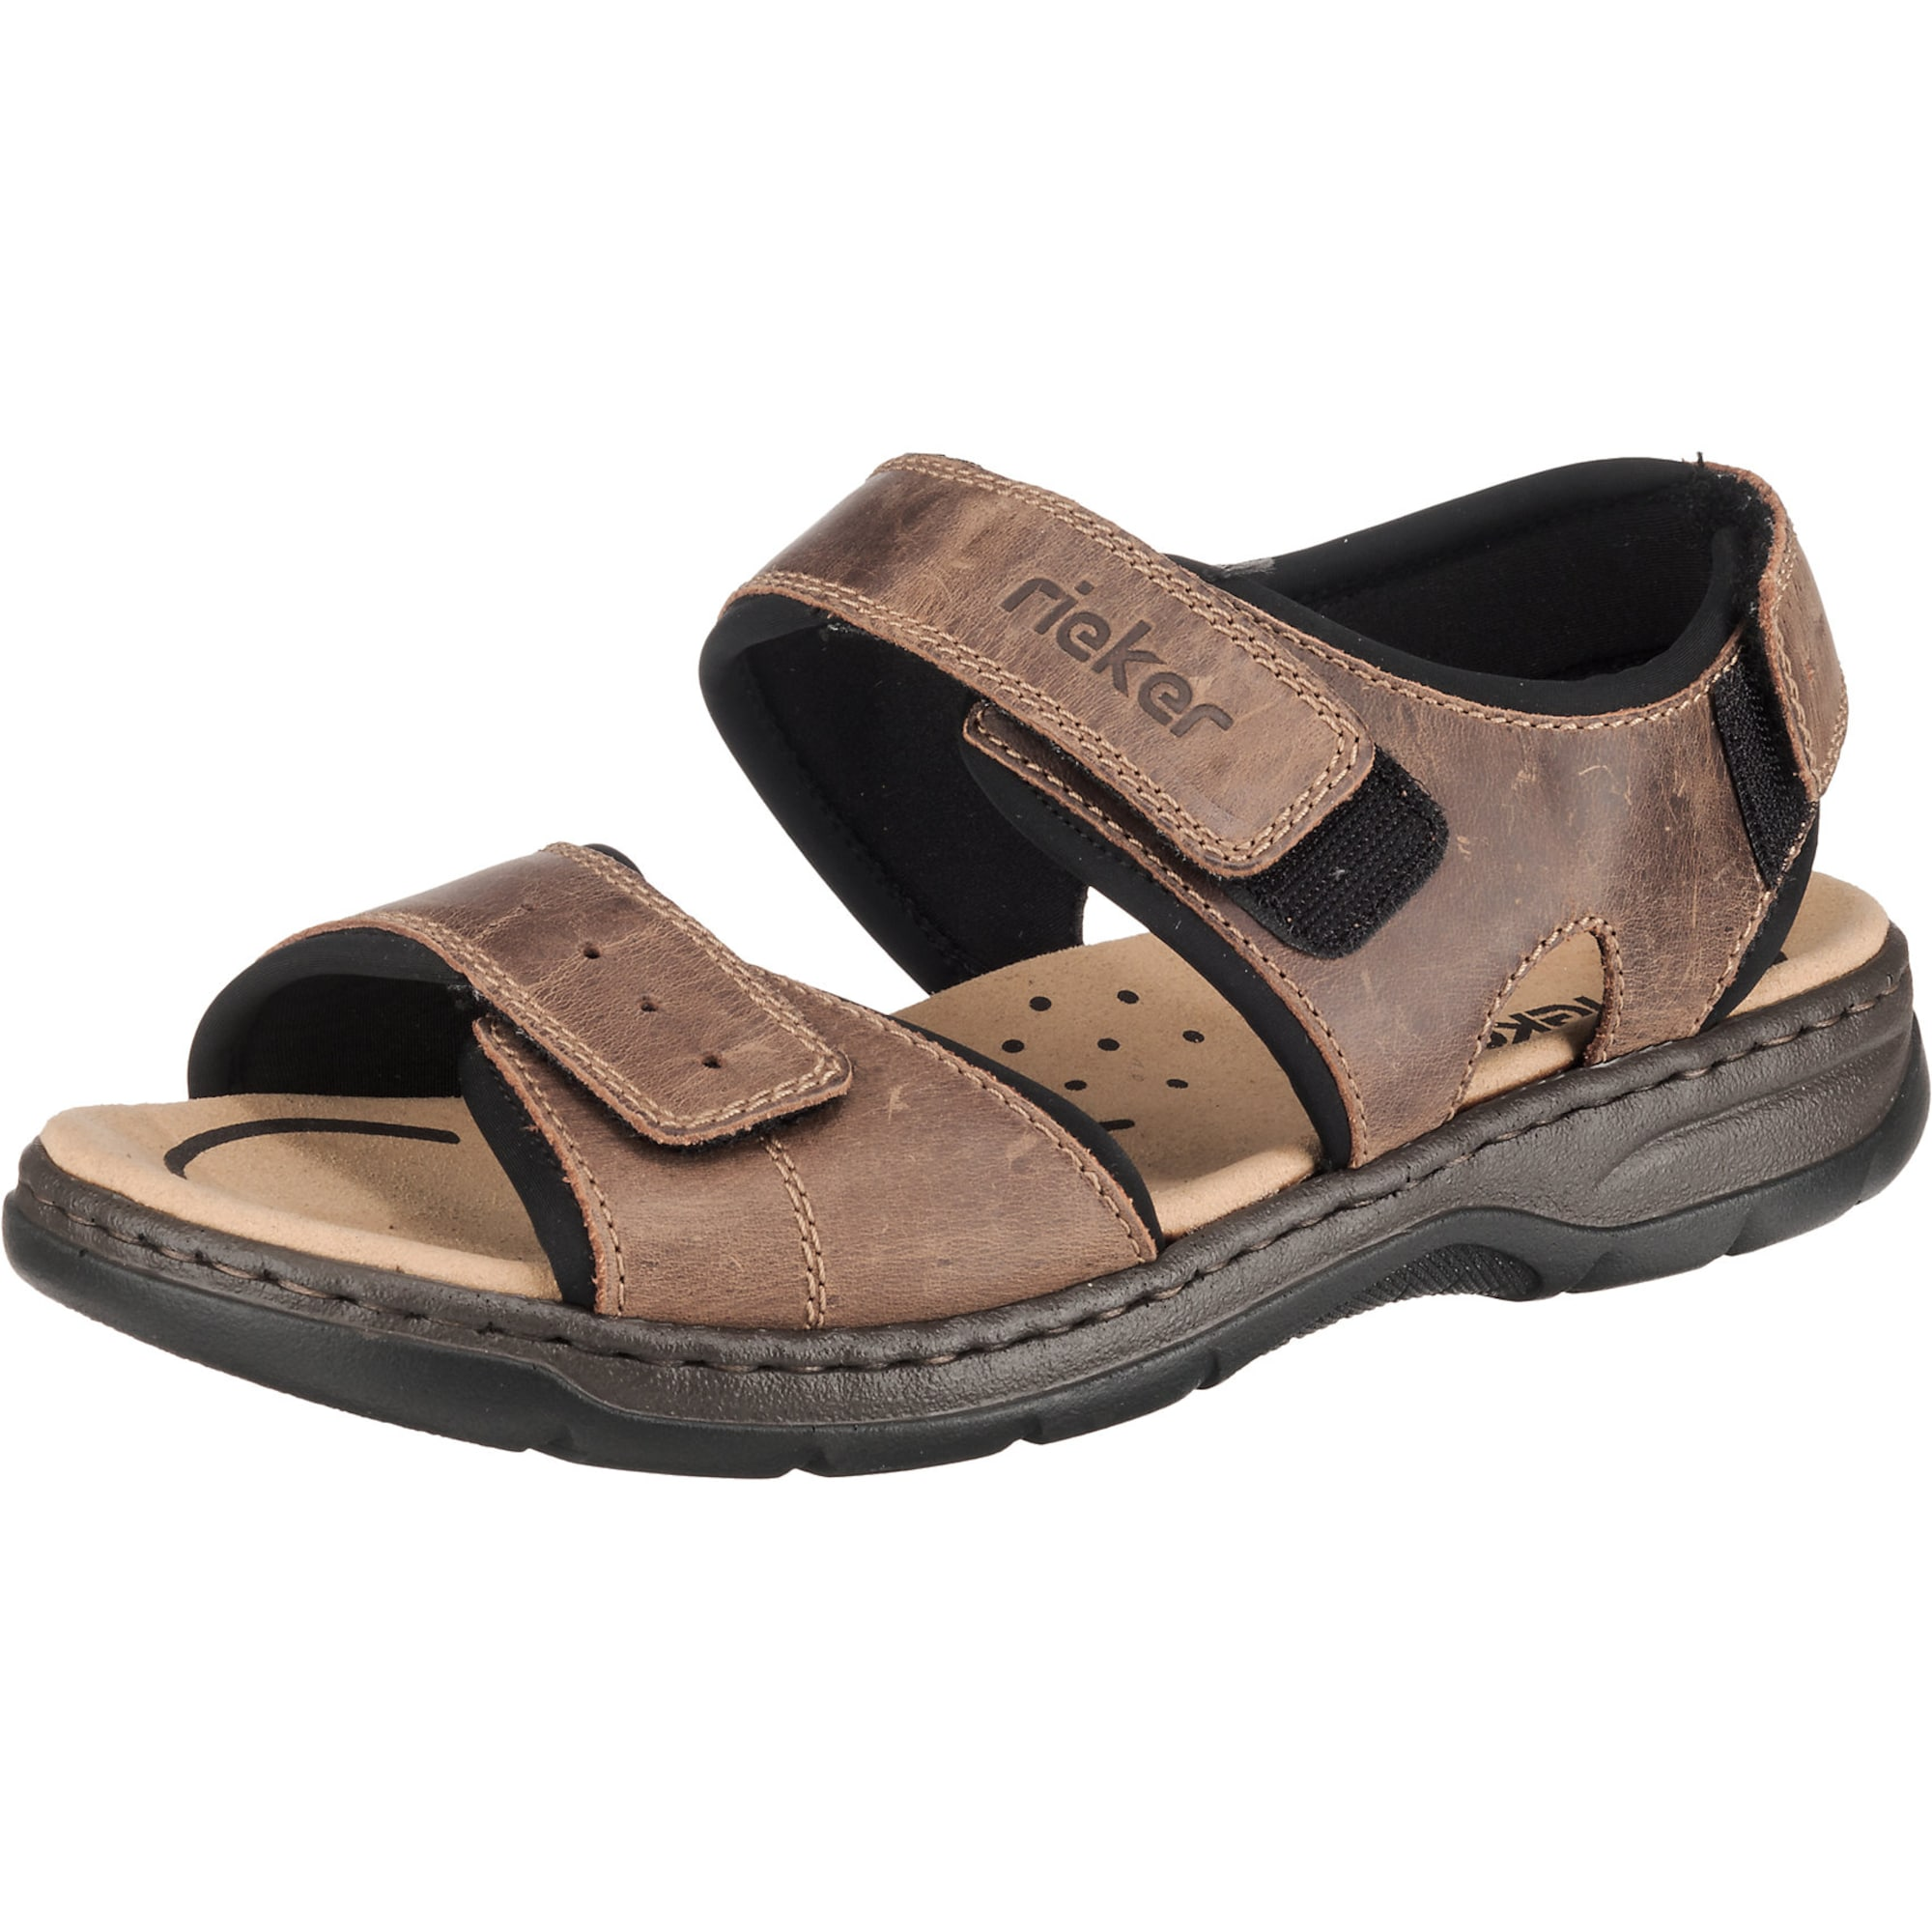 Sandale | Schuhe > Sandalen & Zehentrenner | RIEKER